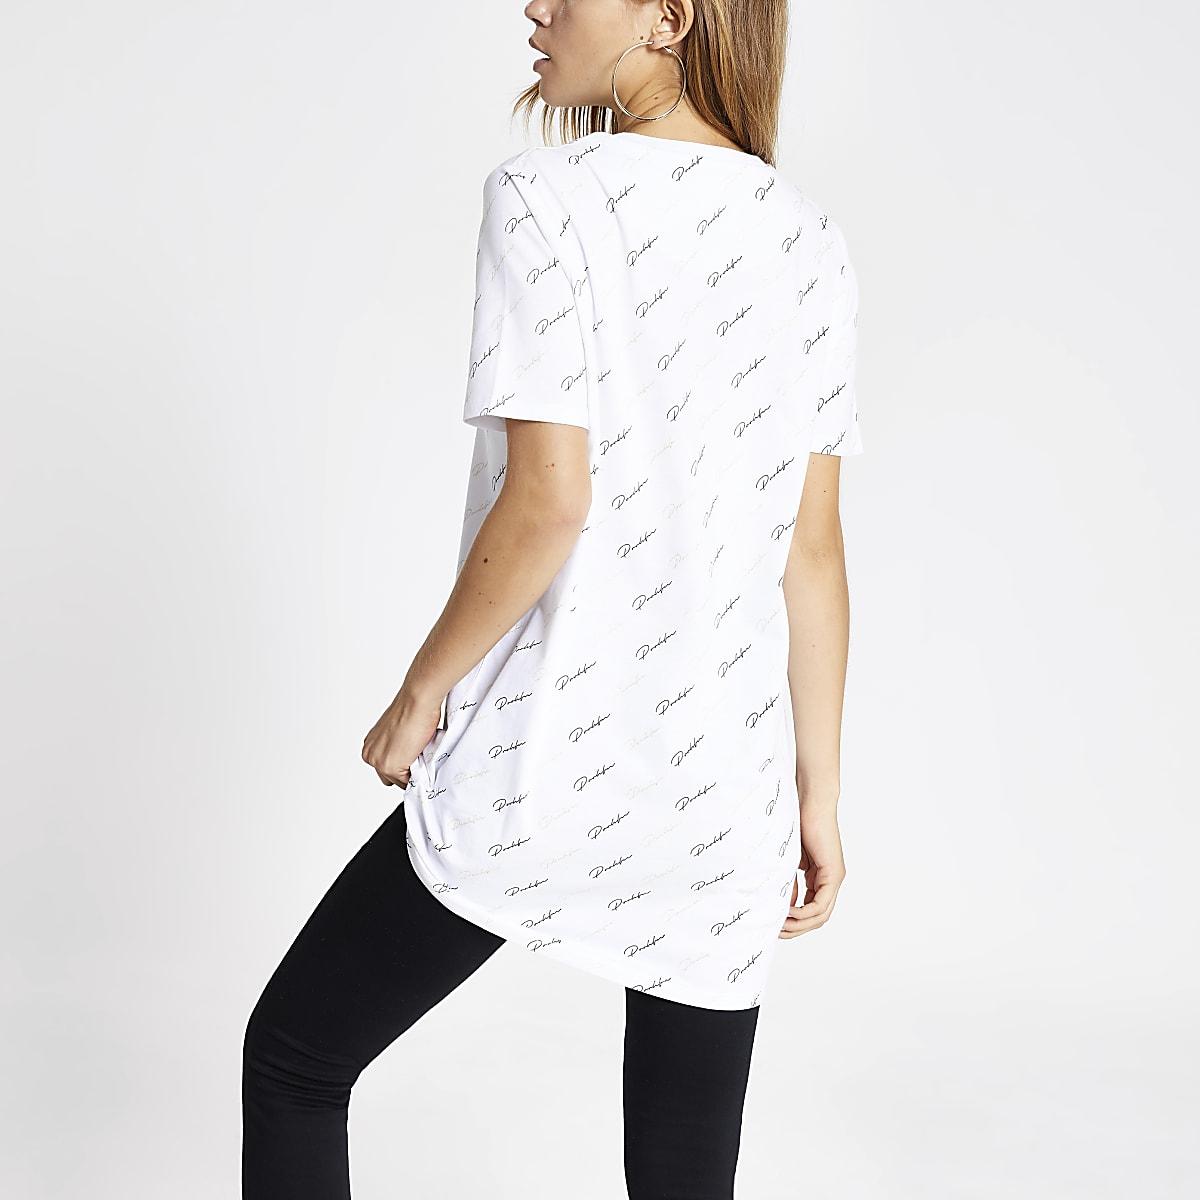 f9d3cc02 White 'Prolific' monogram print T-shirt - T-Shirts - Tops - women